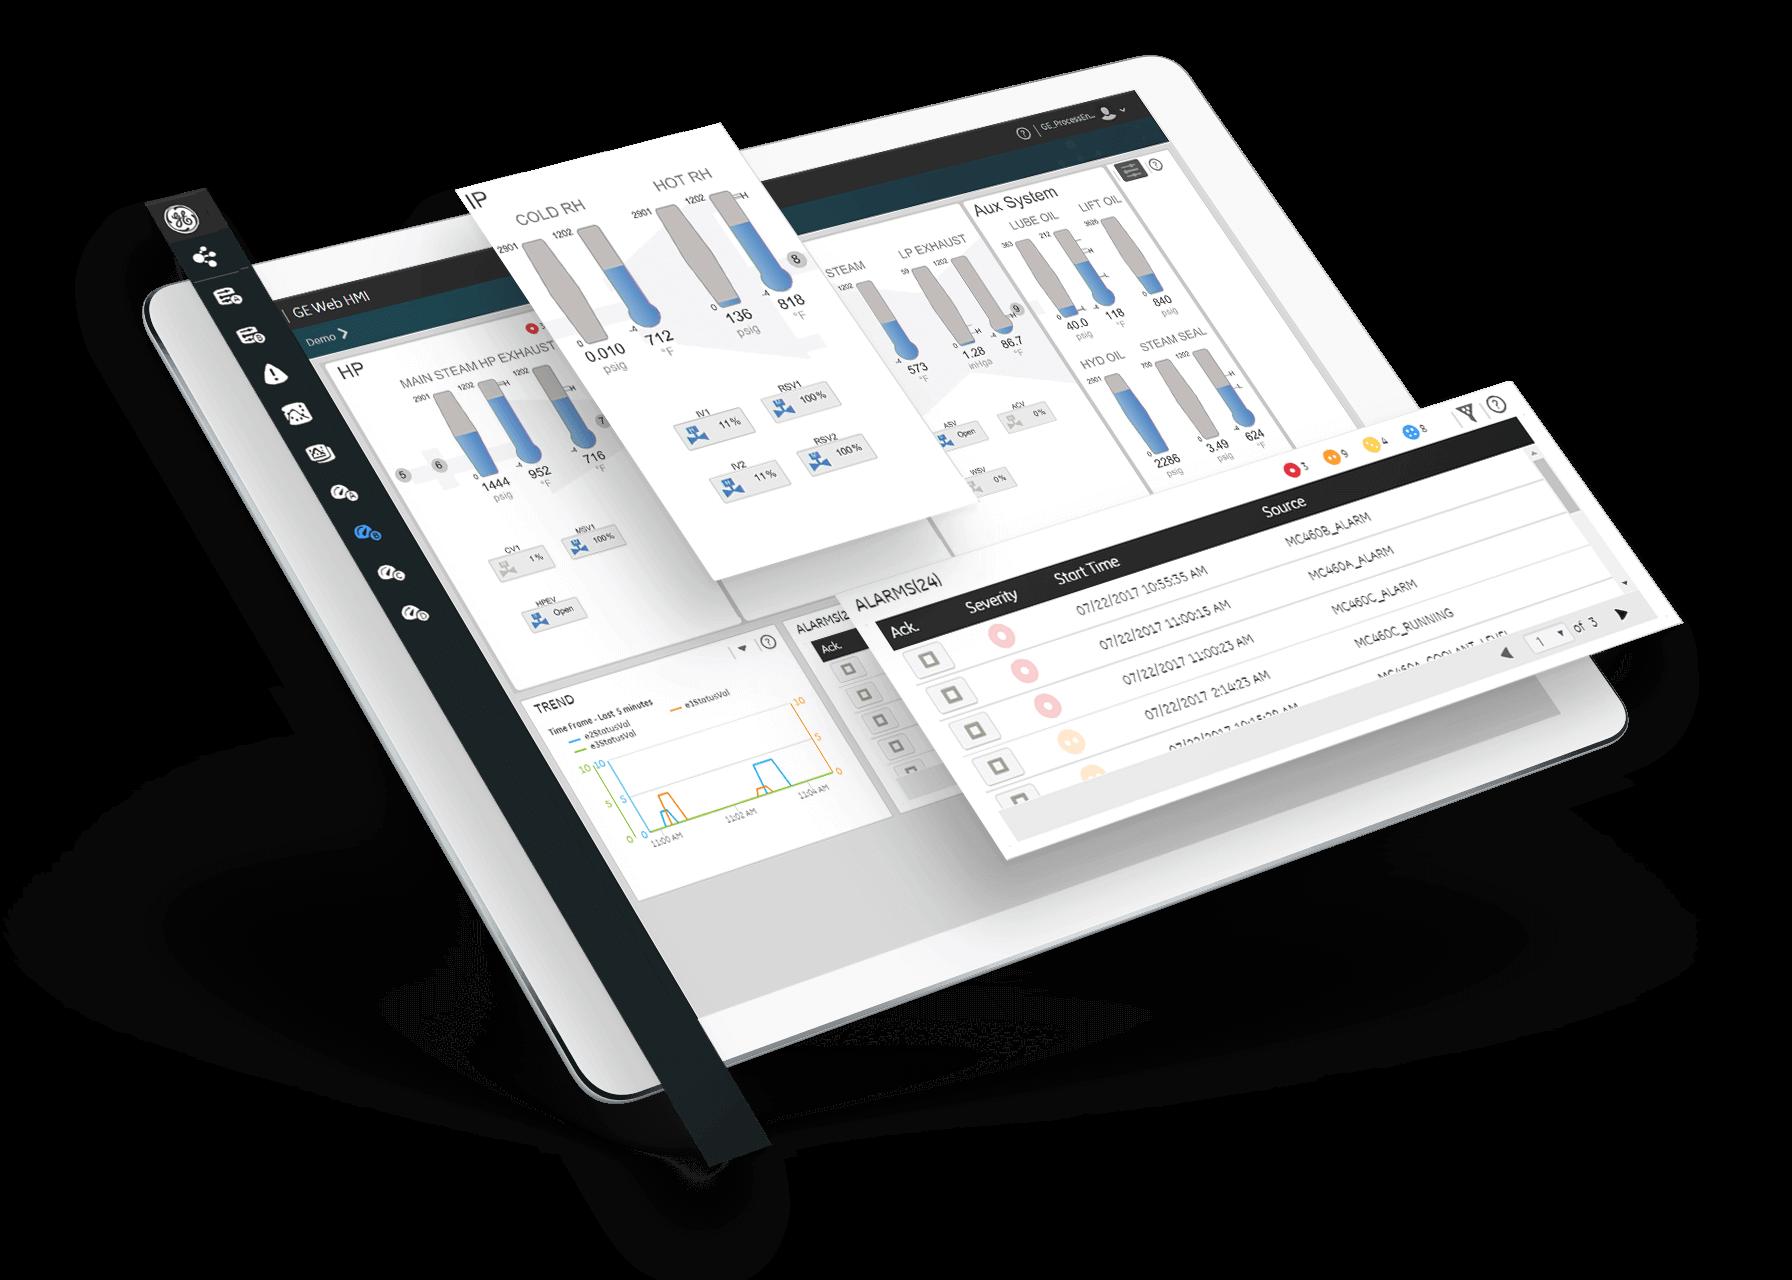 HMI/SCADA software from GE Digital | Screenshot for alarm managementHMI/SCADA software from GE Digital | Screenshot for alarm management